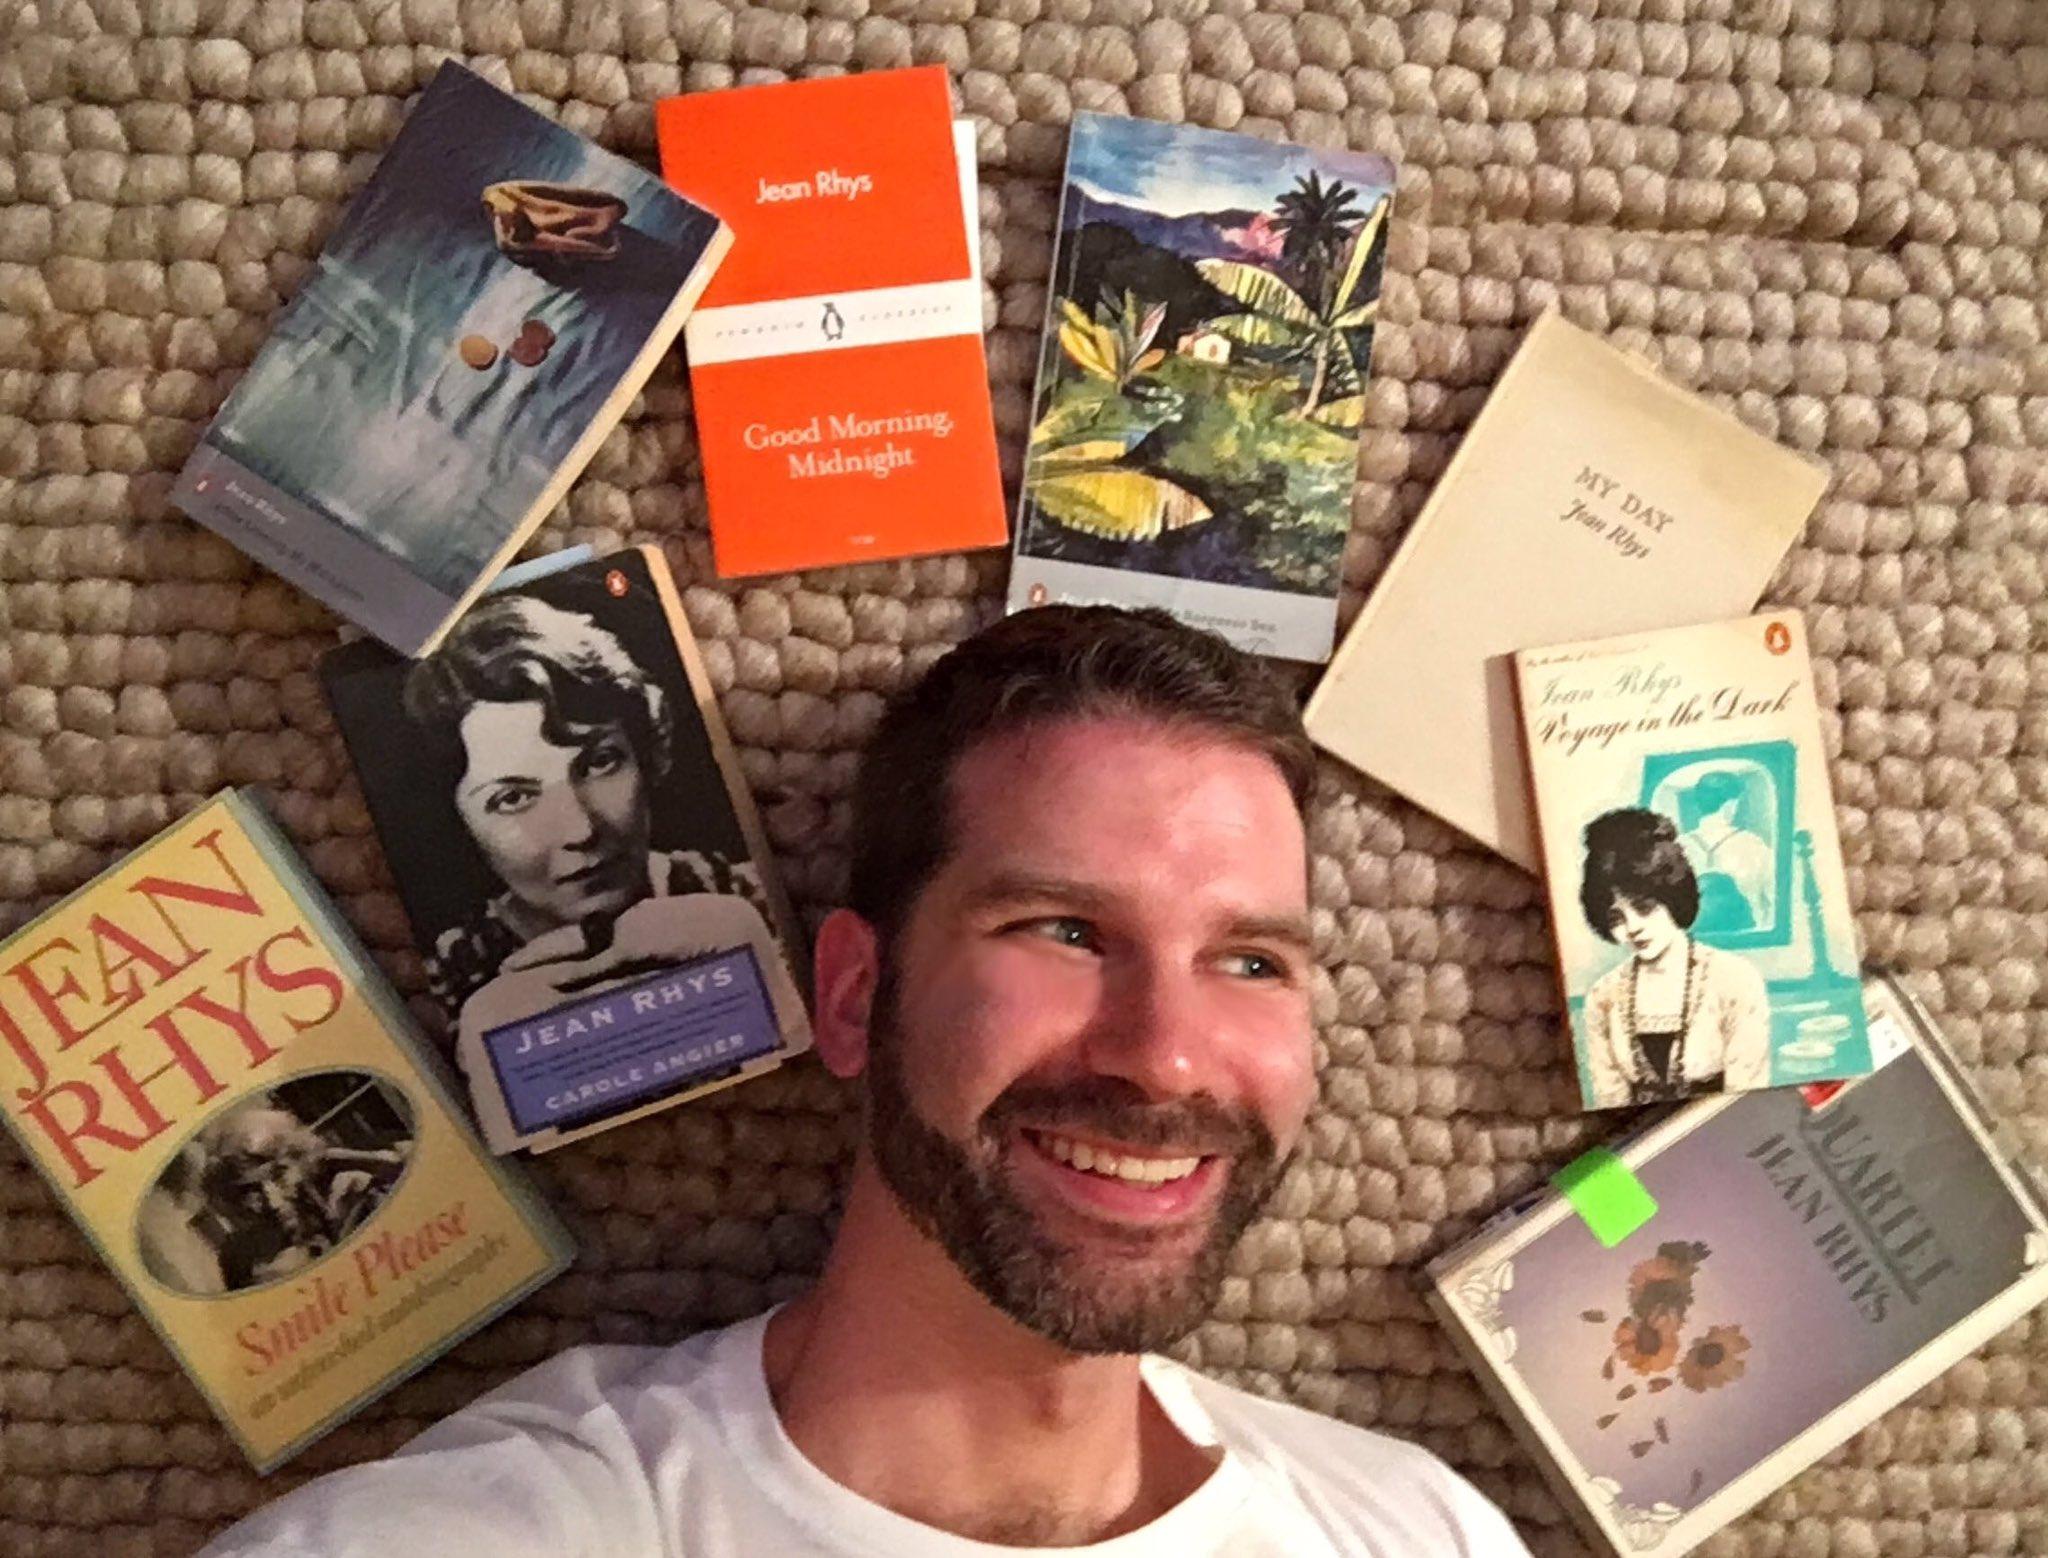 Jean Rhys Reading Week begins today! Details of how to join in here: https://t.co/q468QdUKnm #ReadingRhys #readalong https://t.co/zrDQU2Wrrx